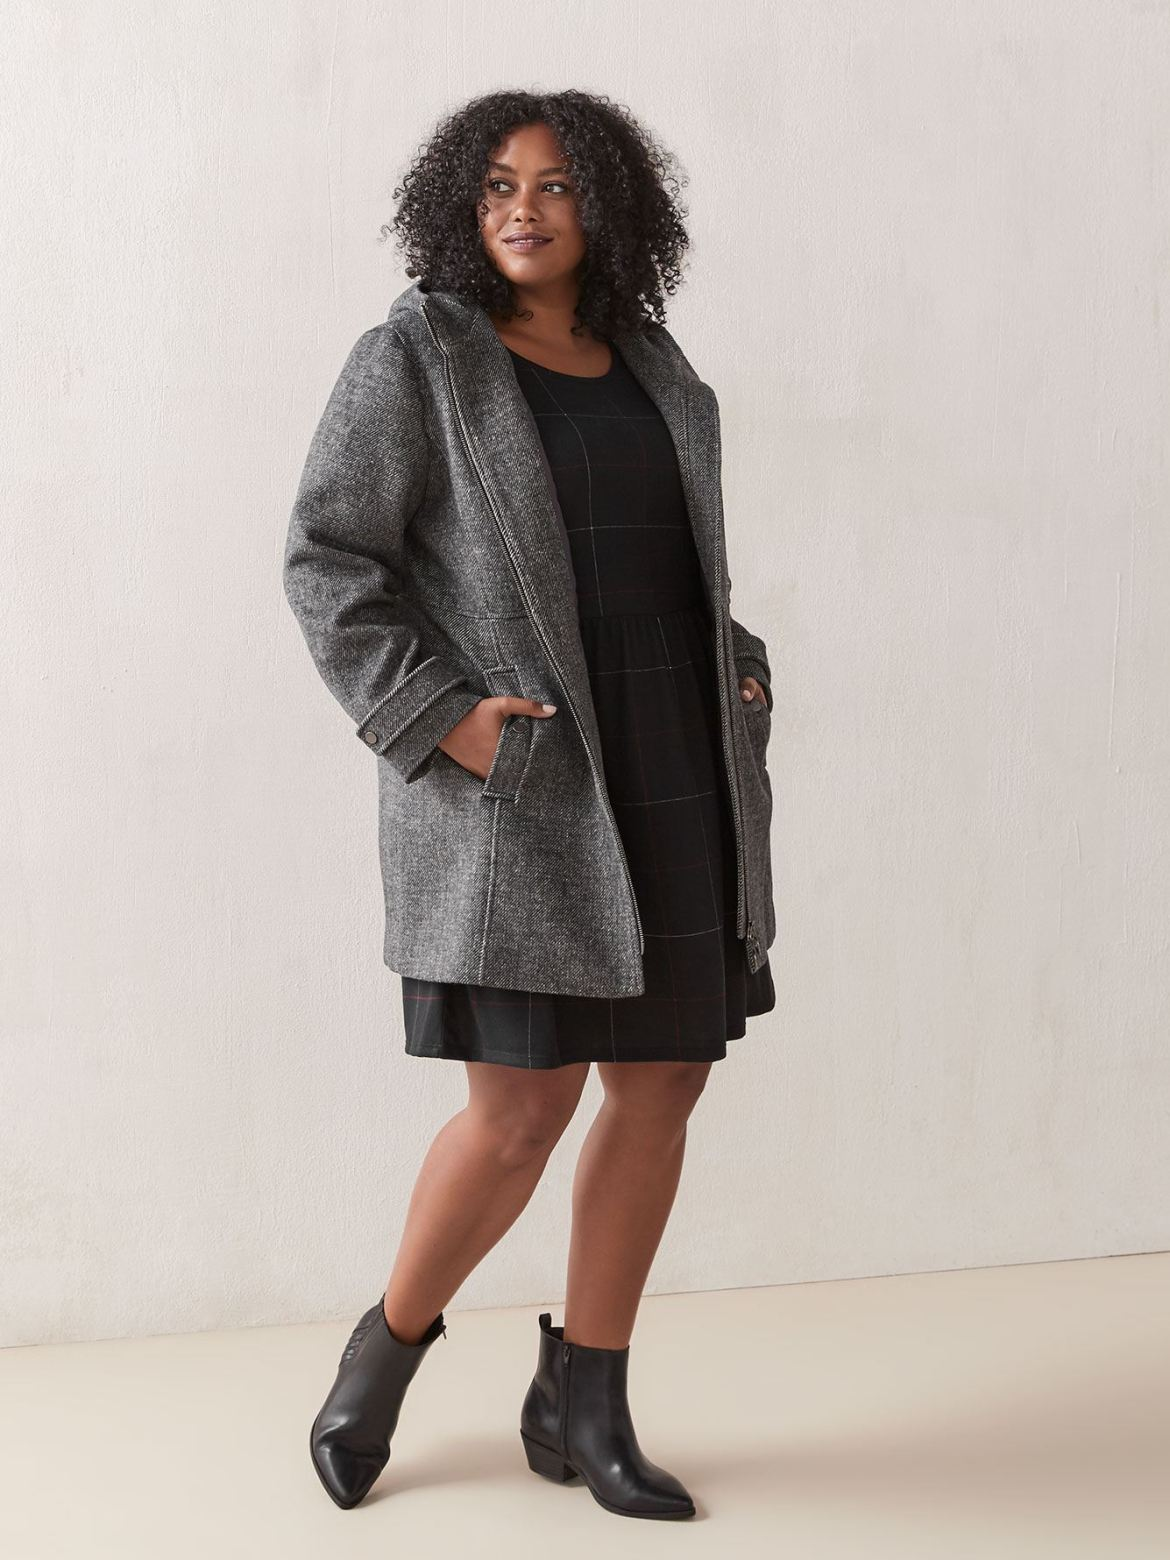 Zip Front Wool Coat - In Every Story